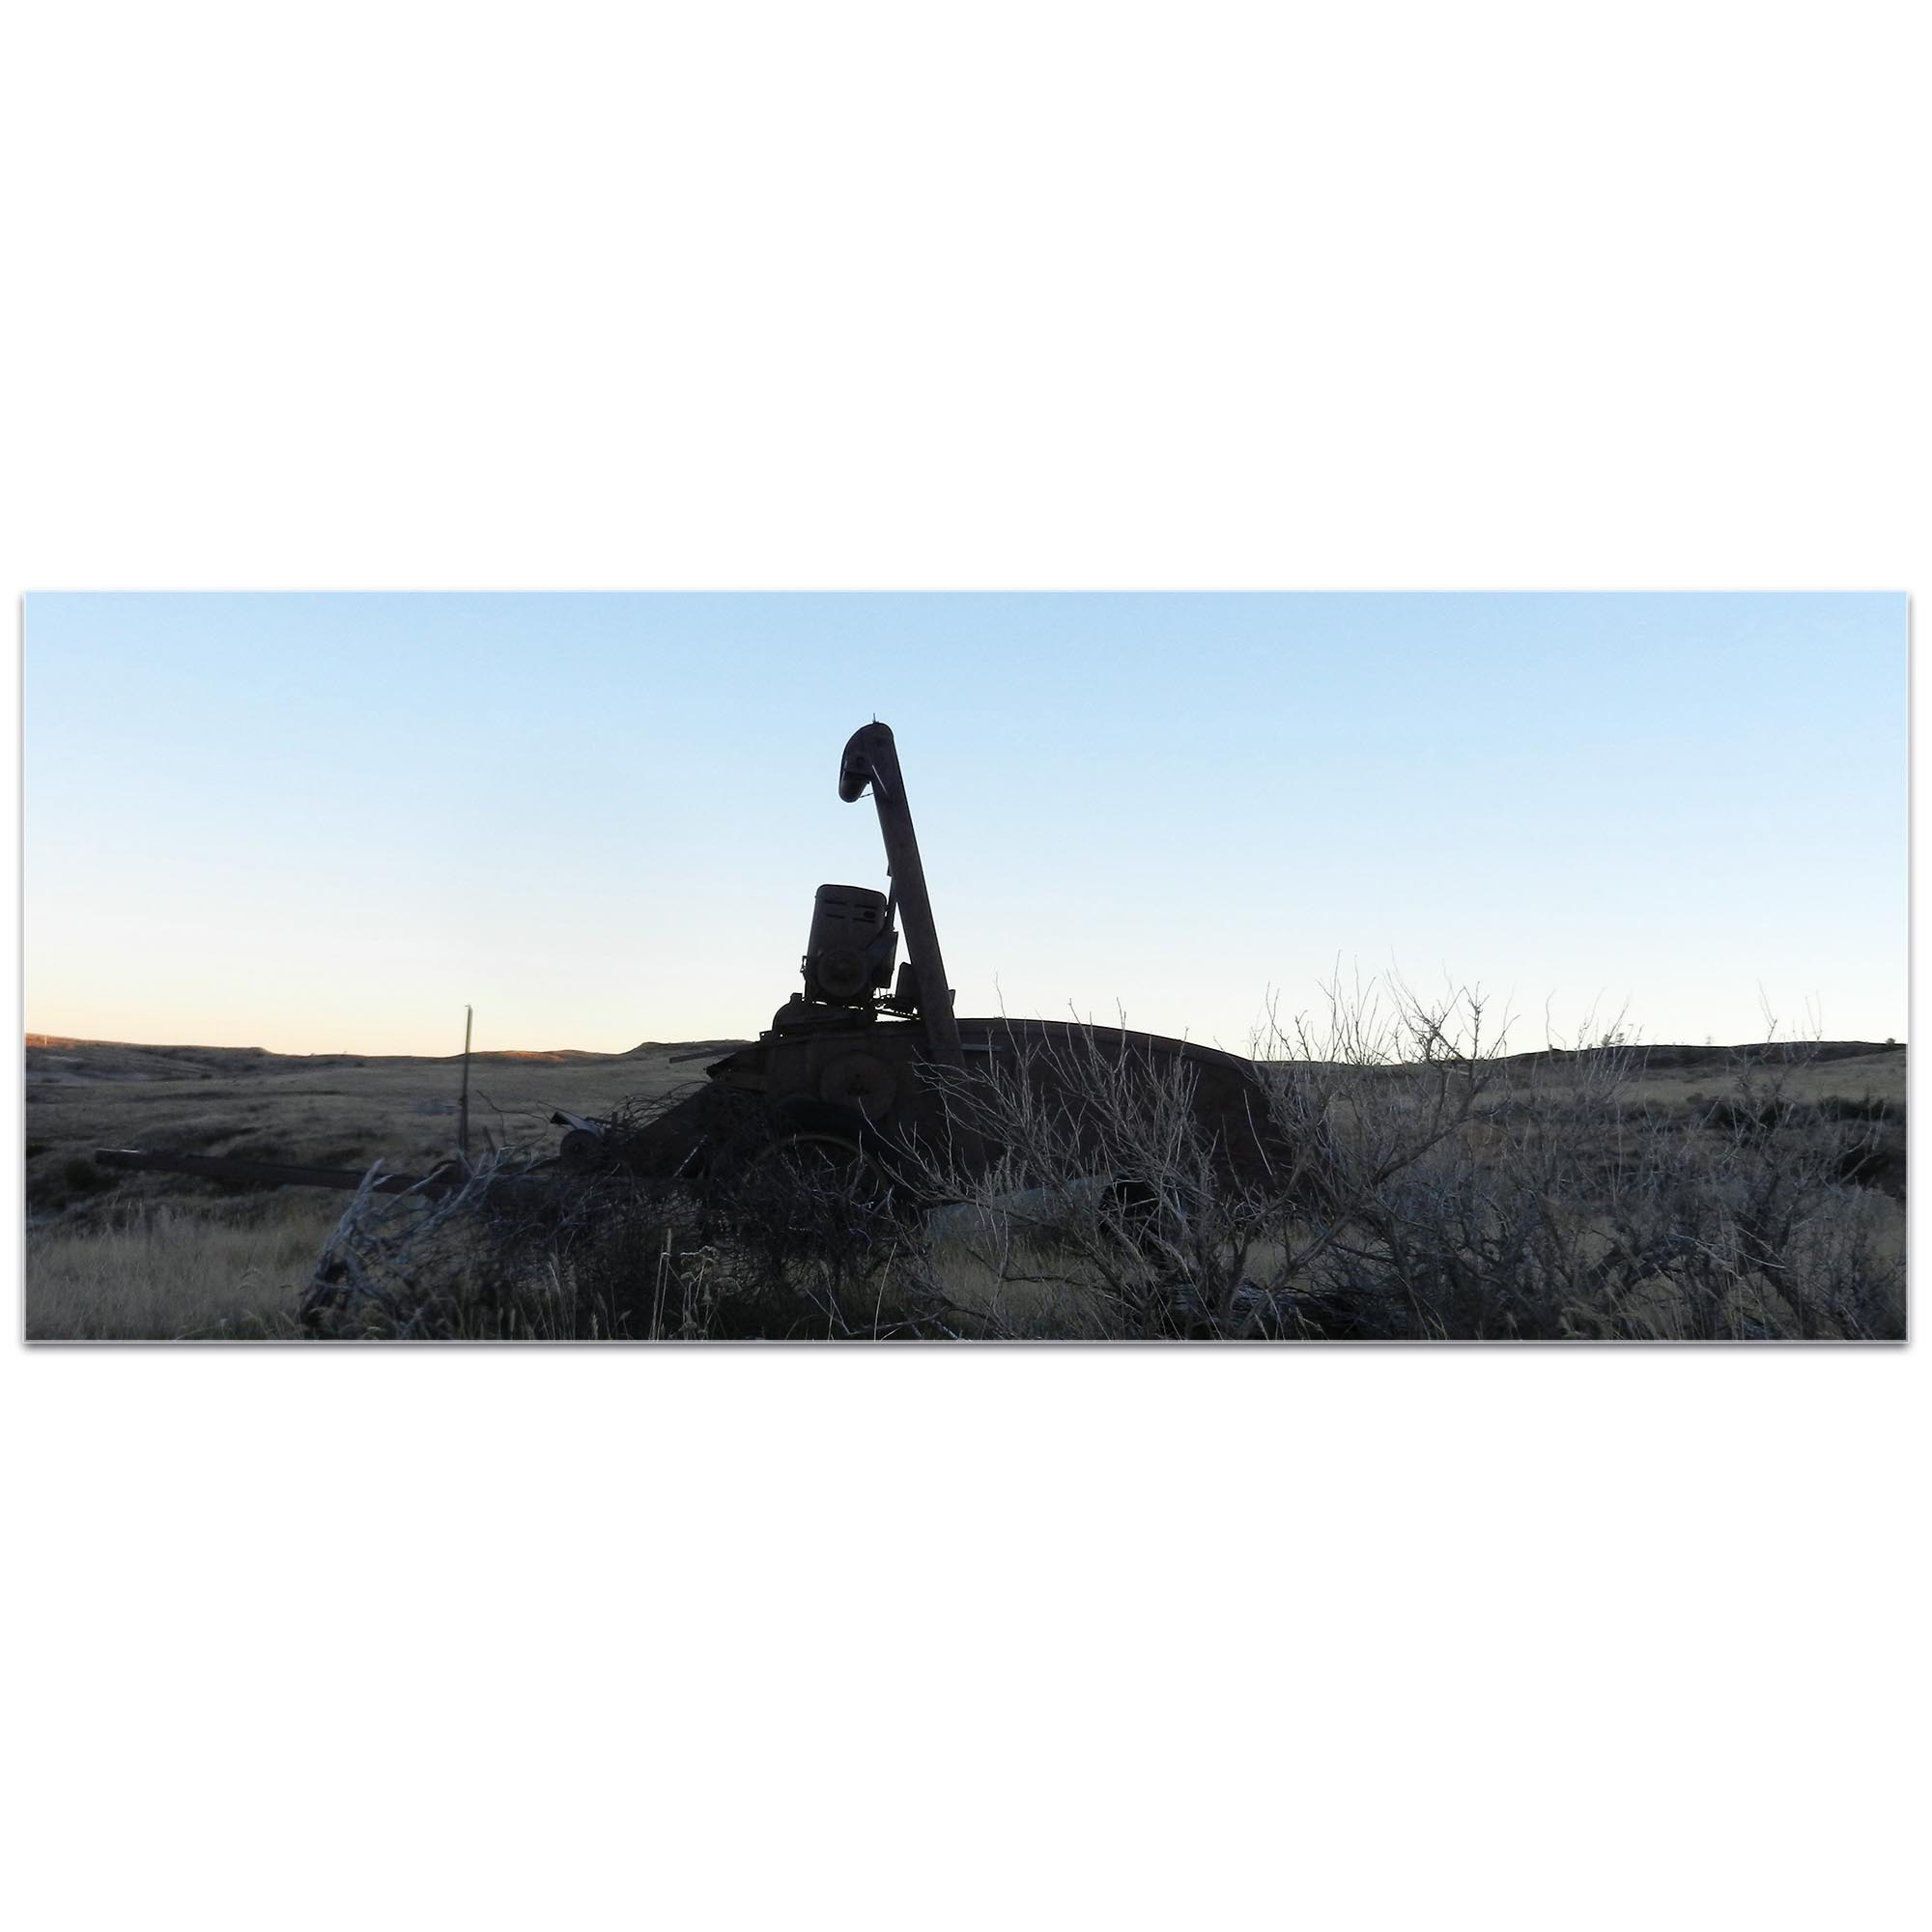 Western Wall Art 'Tractor Sunrise' - American West Decor on Metal or Plexiglass - Image 2